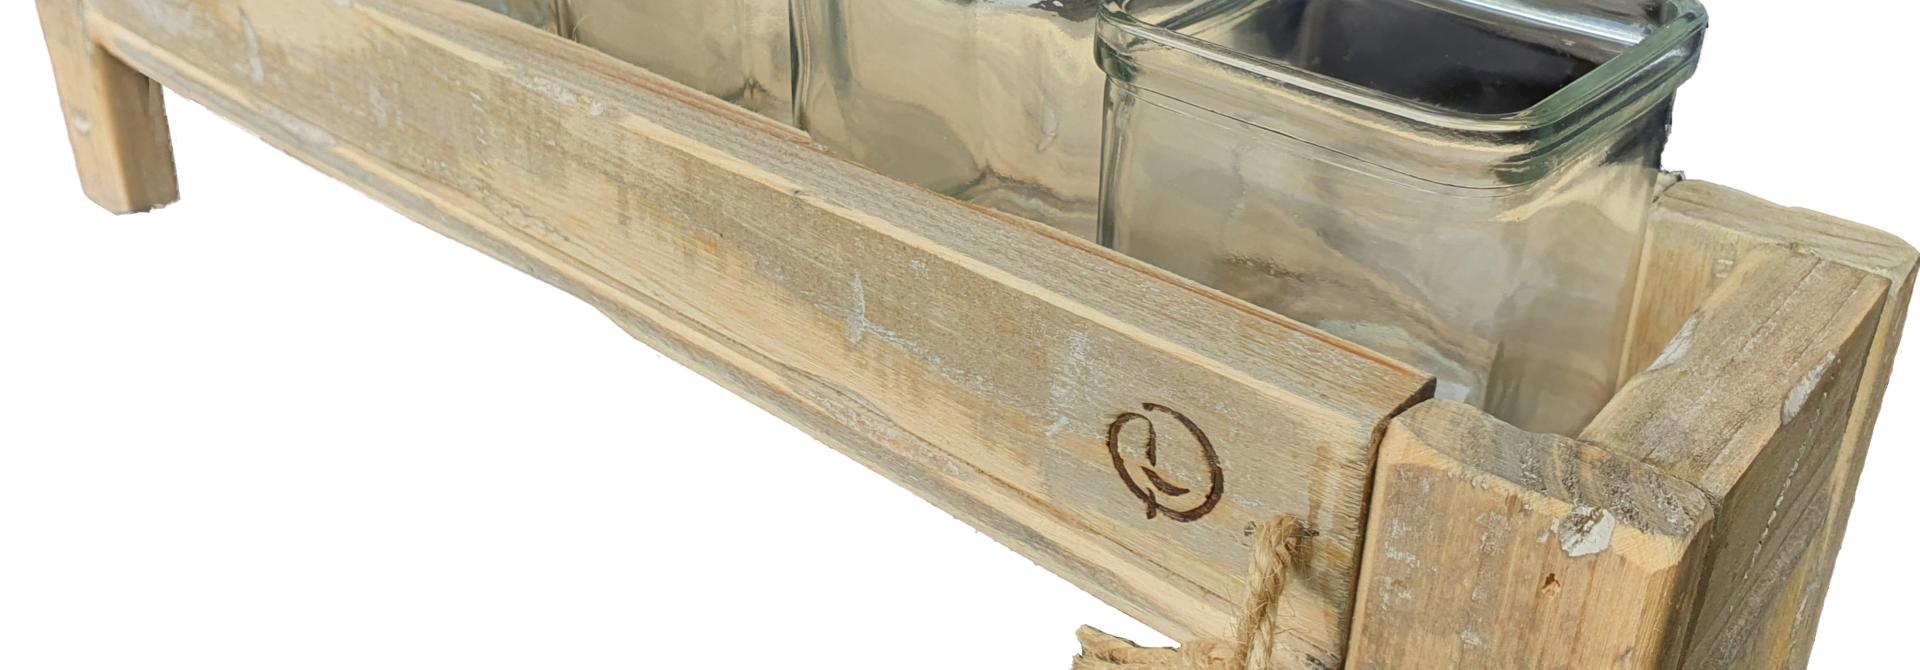 tray old dutch glass hold narrow 50